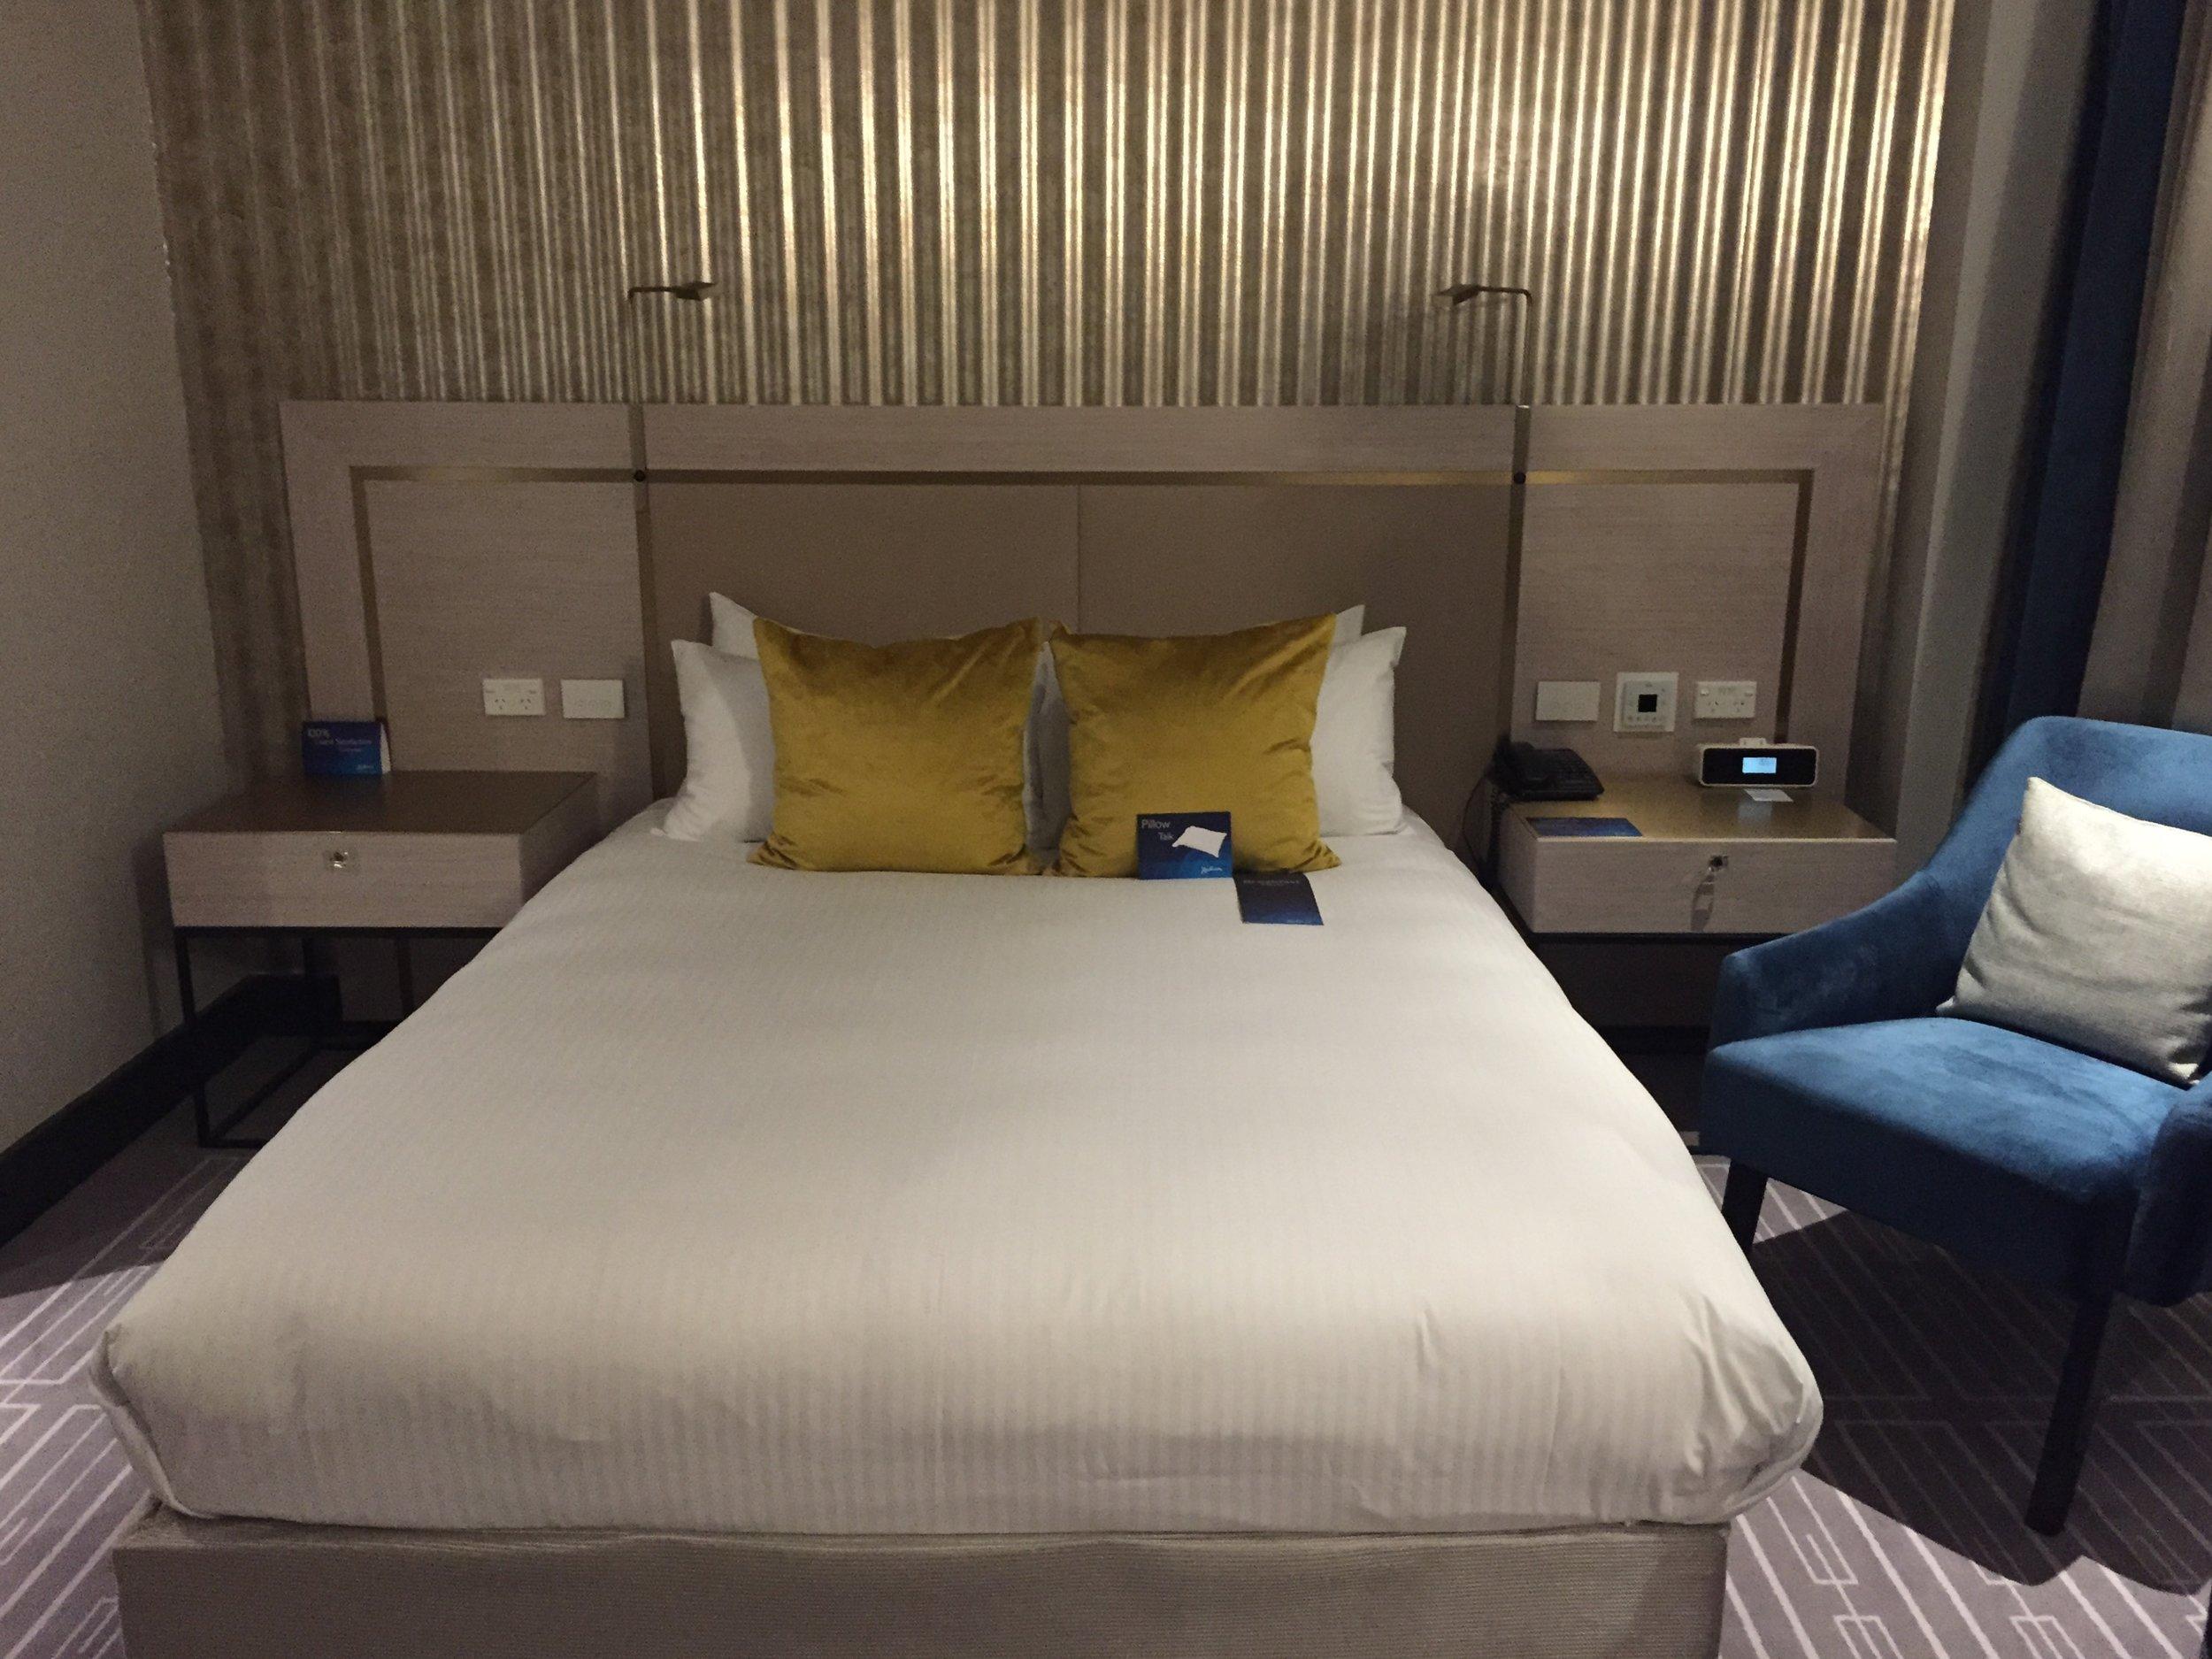 Hotel Tonight - Radisson Blu Sydney